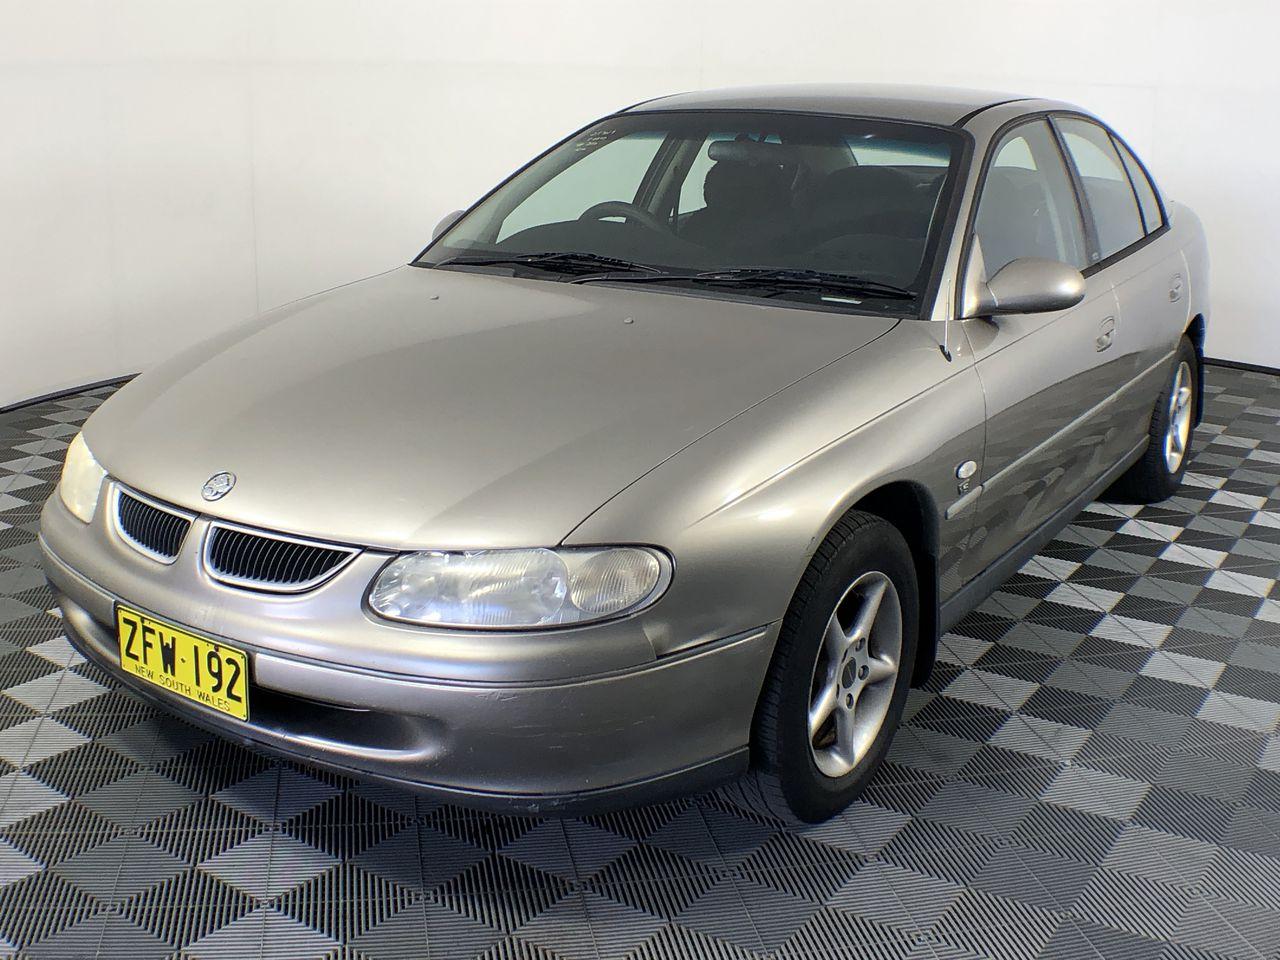 2000 Holden Commodore Acclaim VT Automatic Sedan